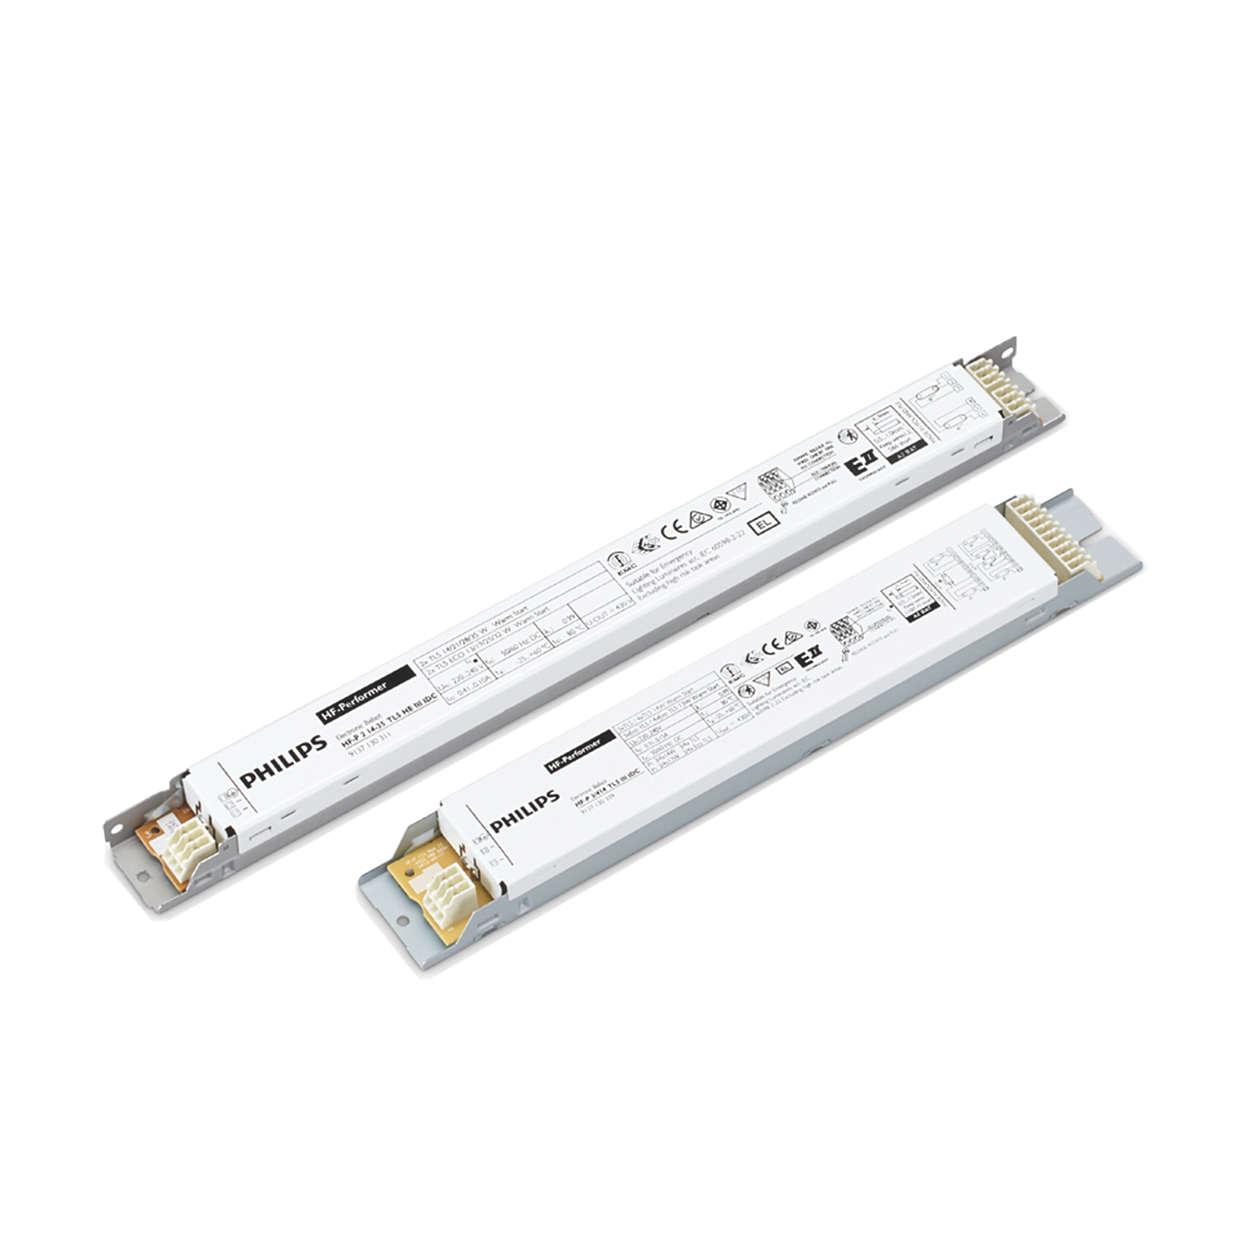 HF-PERFORMER III für TL5 Lampen